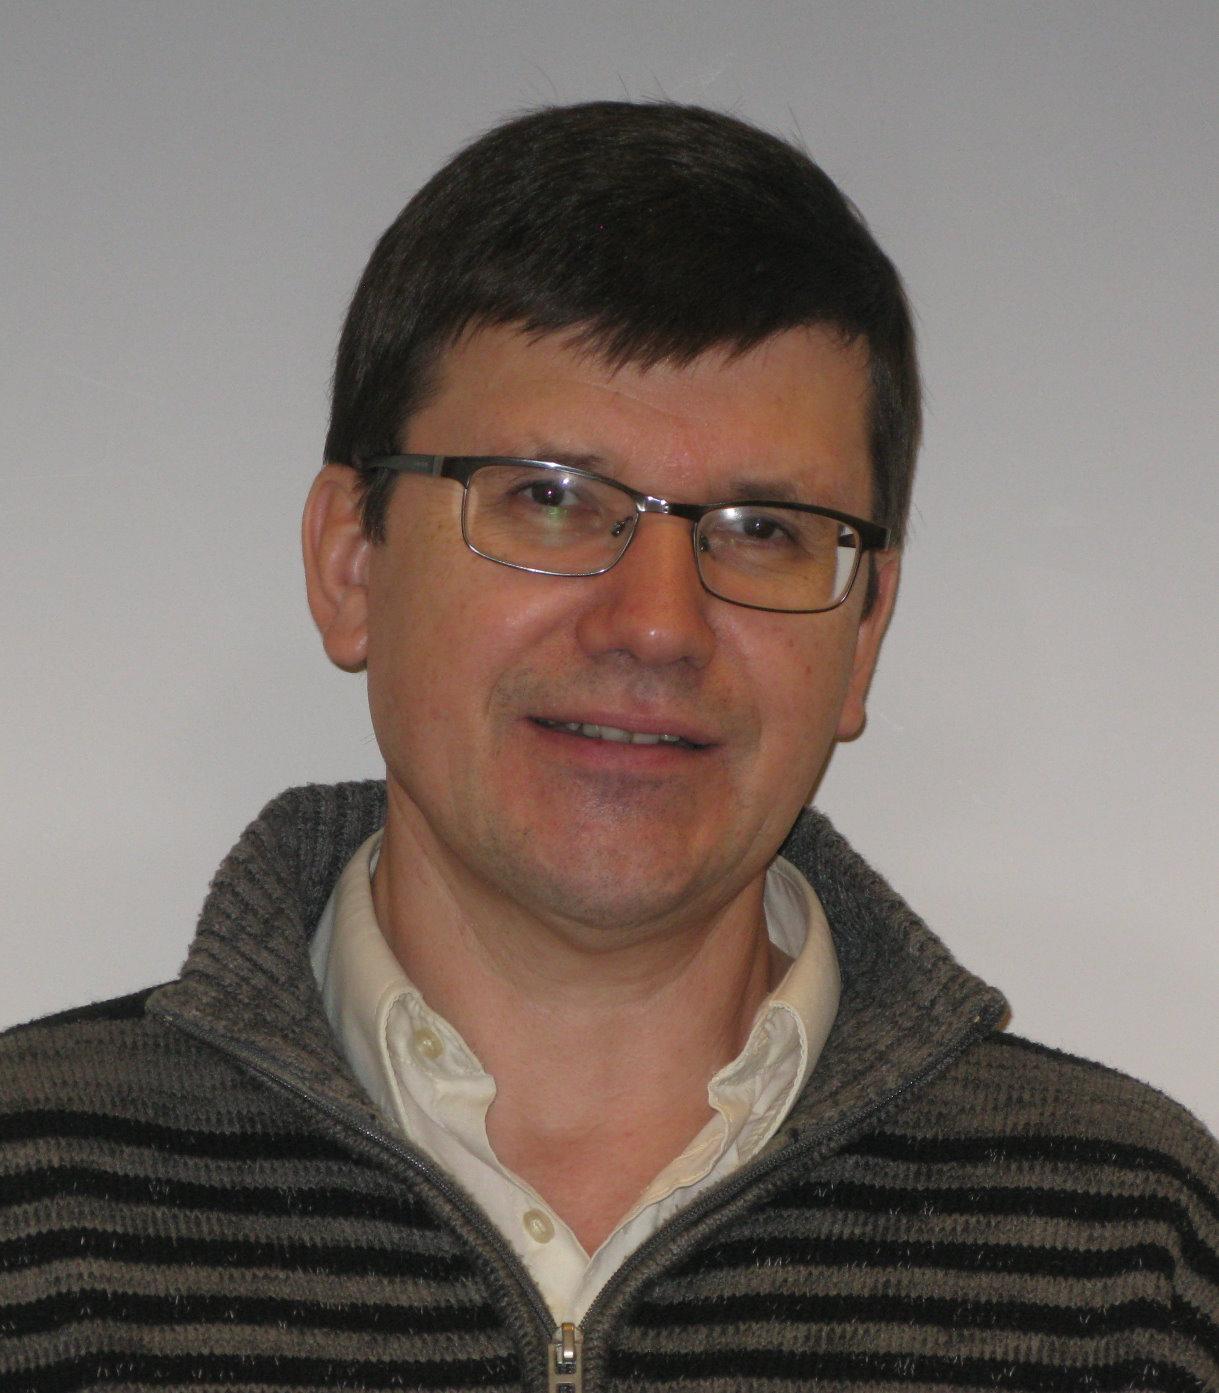 Jens Askov Jensen